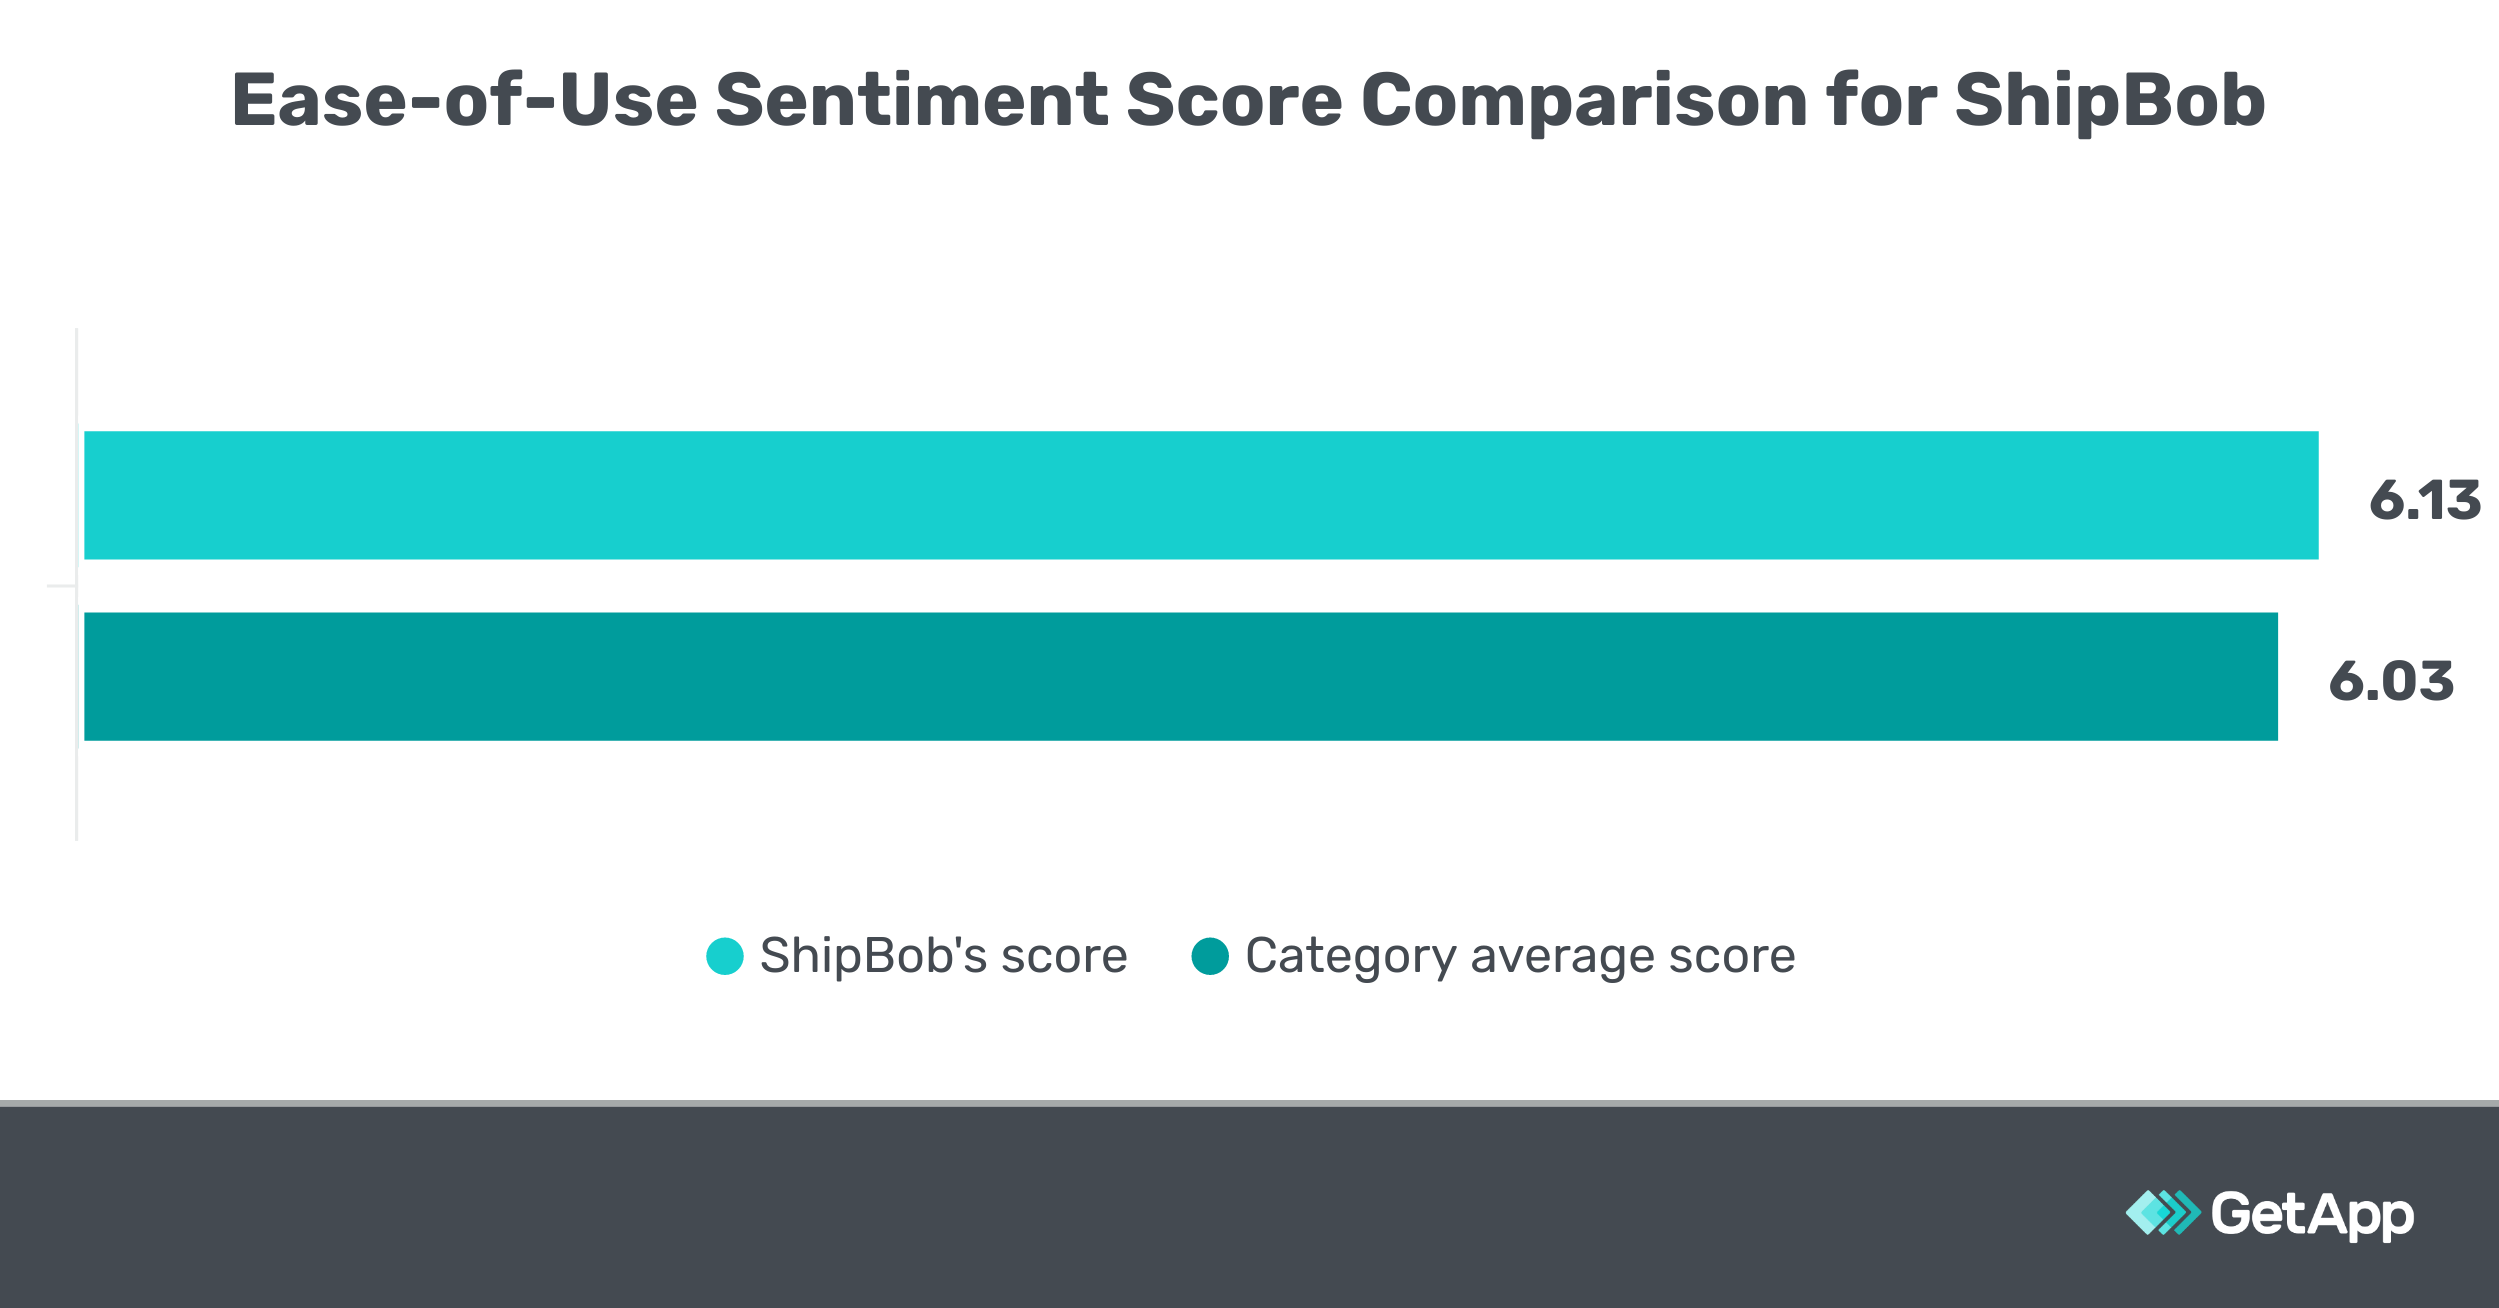 Ease of Use Sentiment Score Comparison for ShipBob